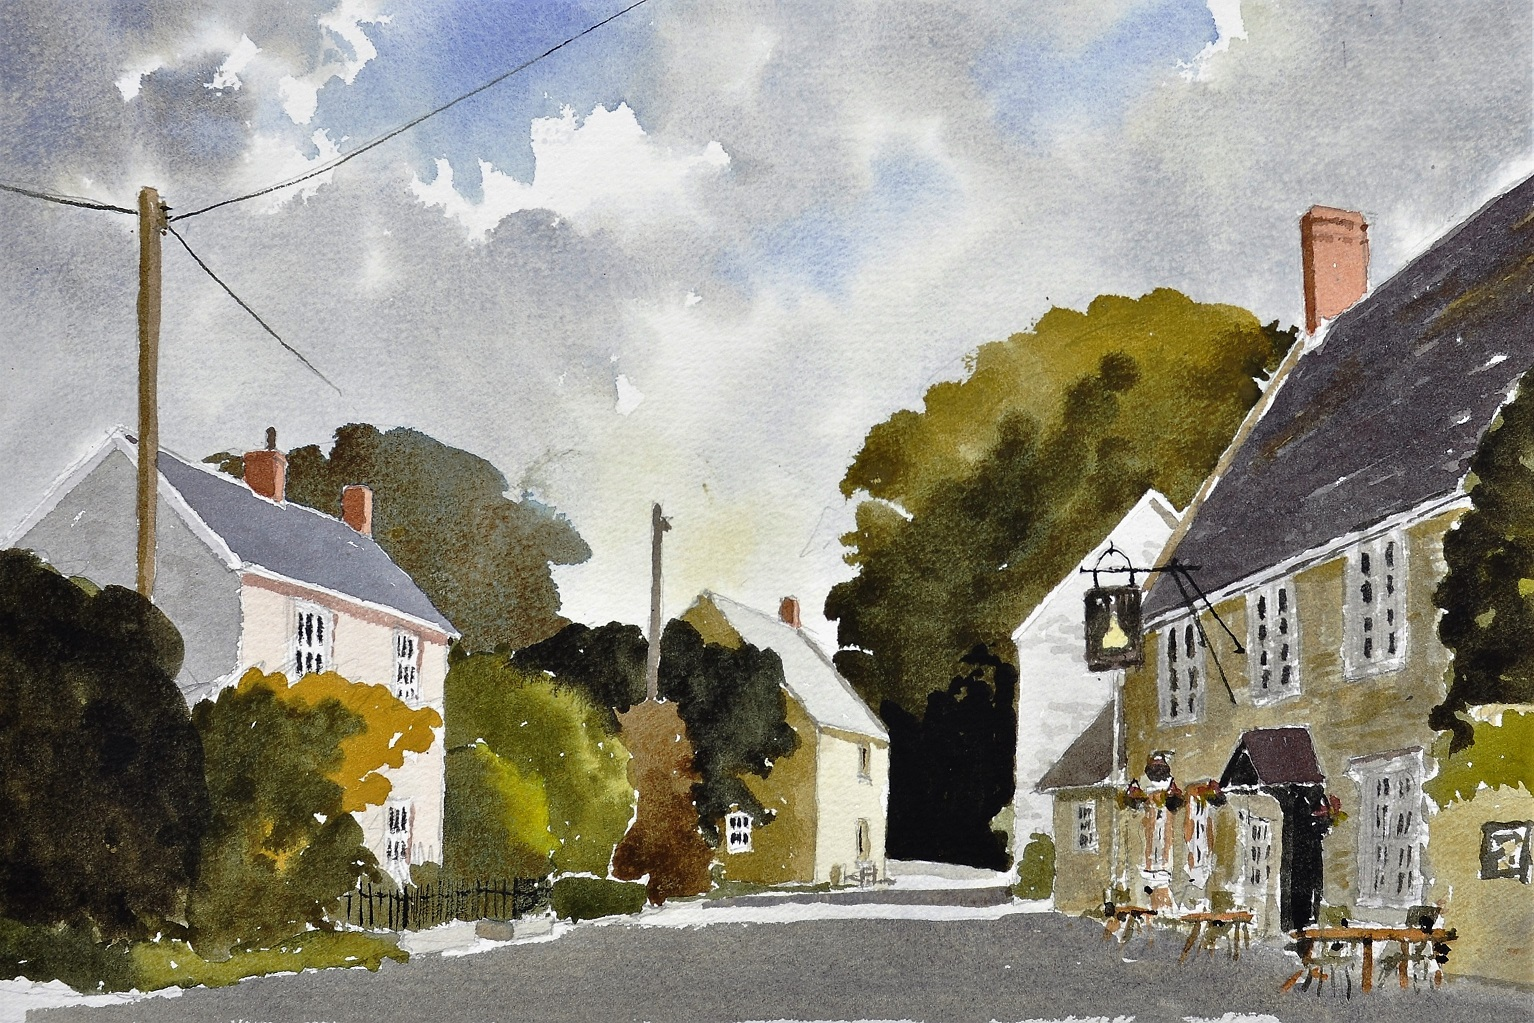 Wylye Village, Wiltshire